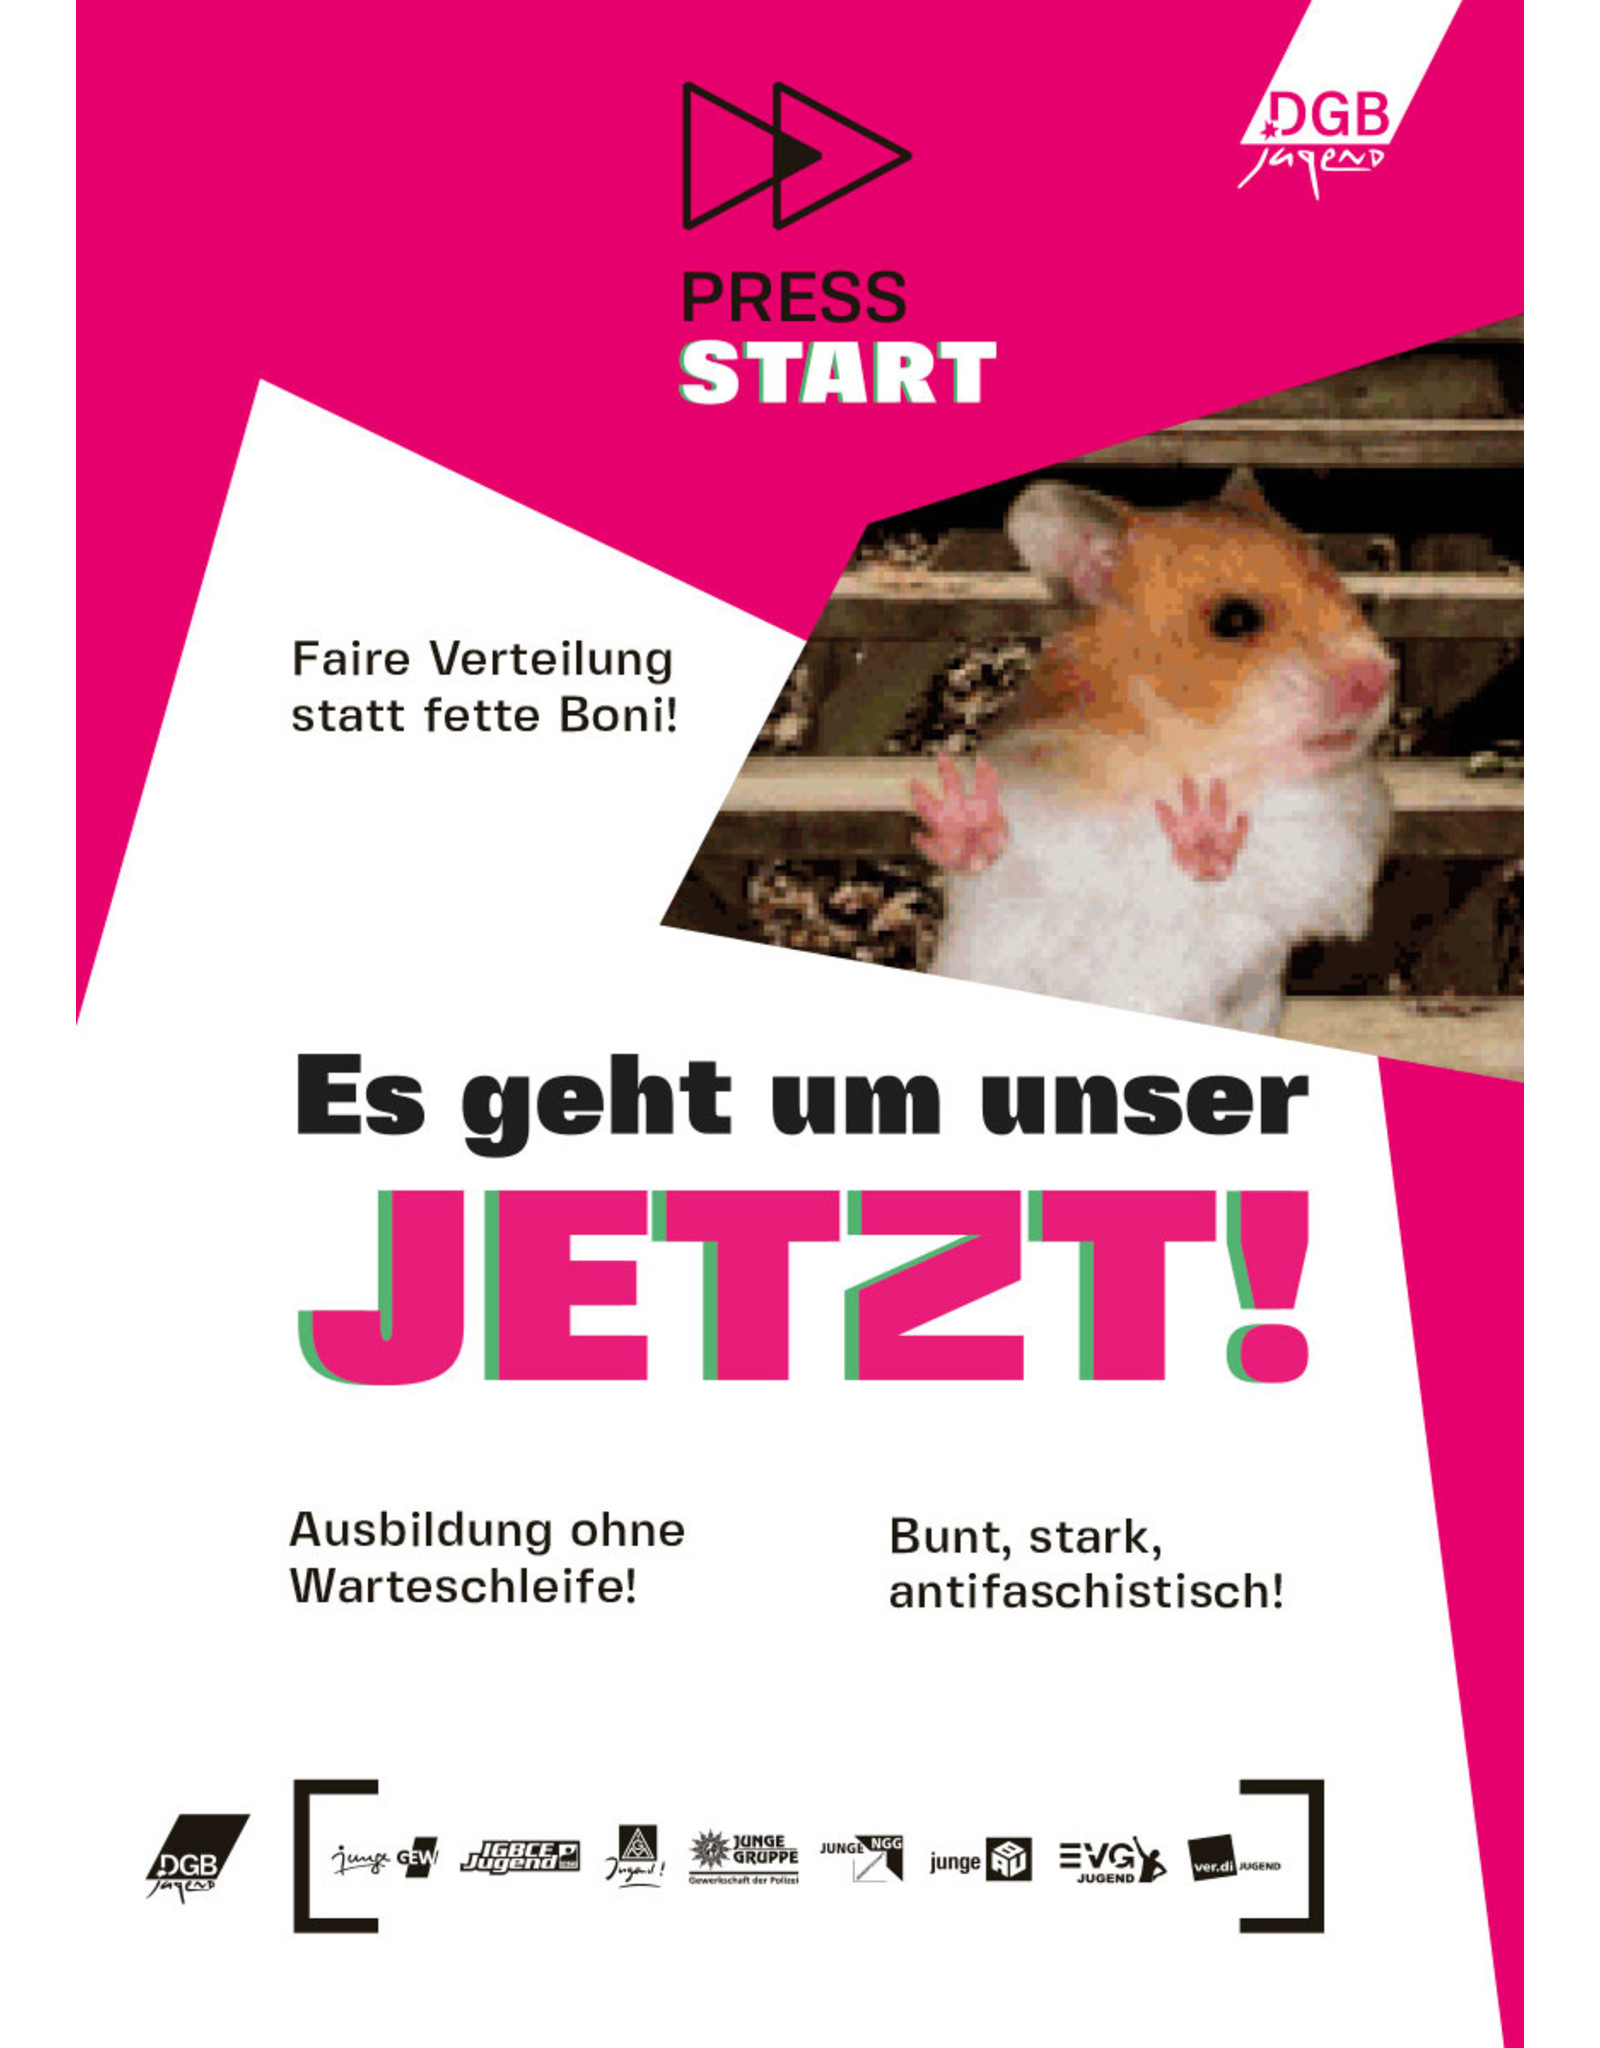 PRESS START – Forderungsmagazin der DGB-Jugend zur Bundestagswahl 2021